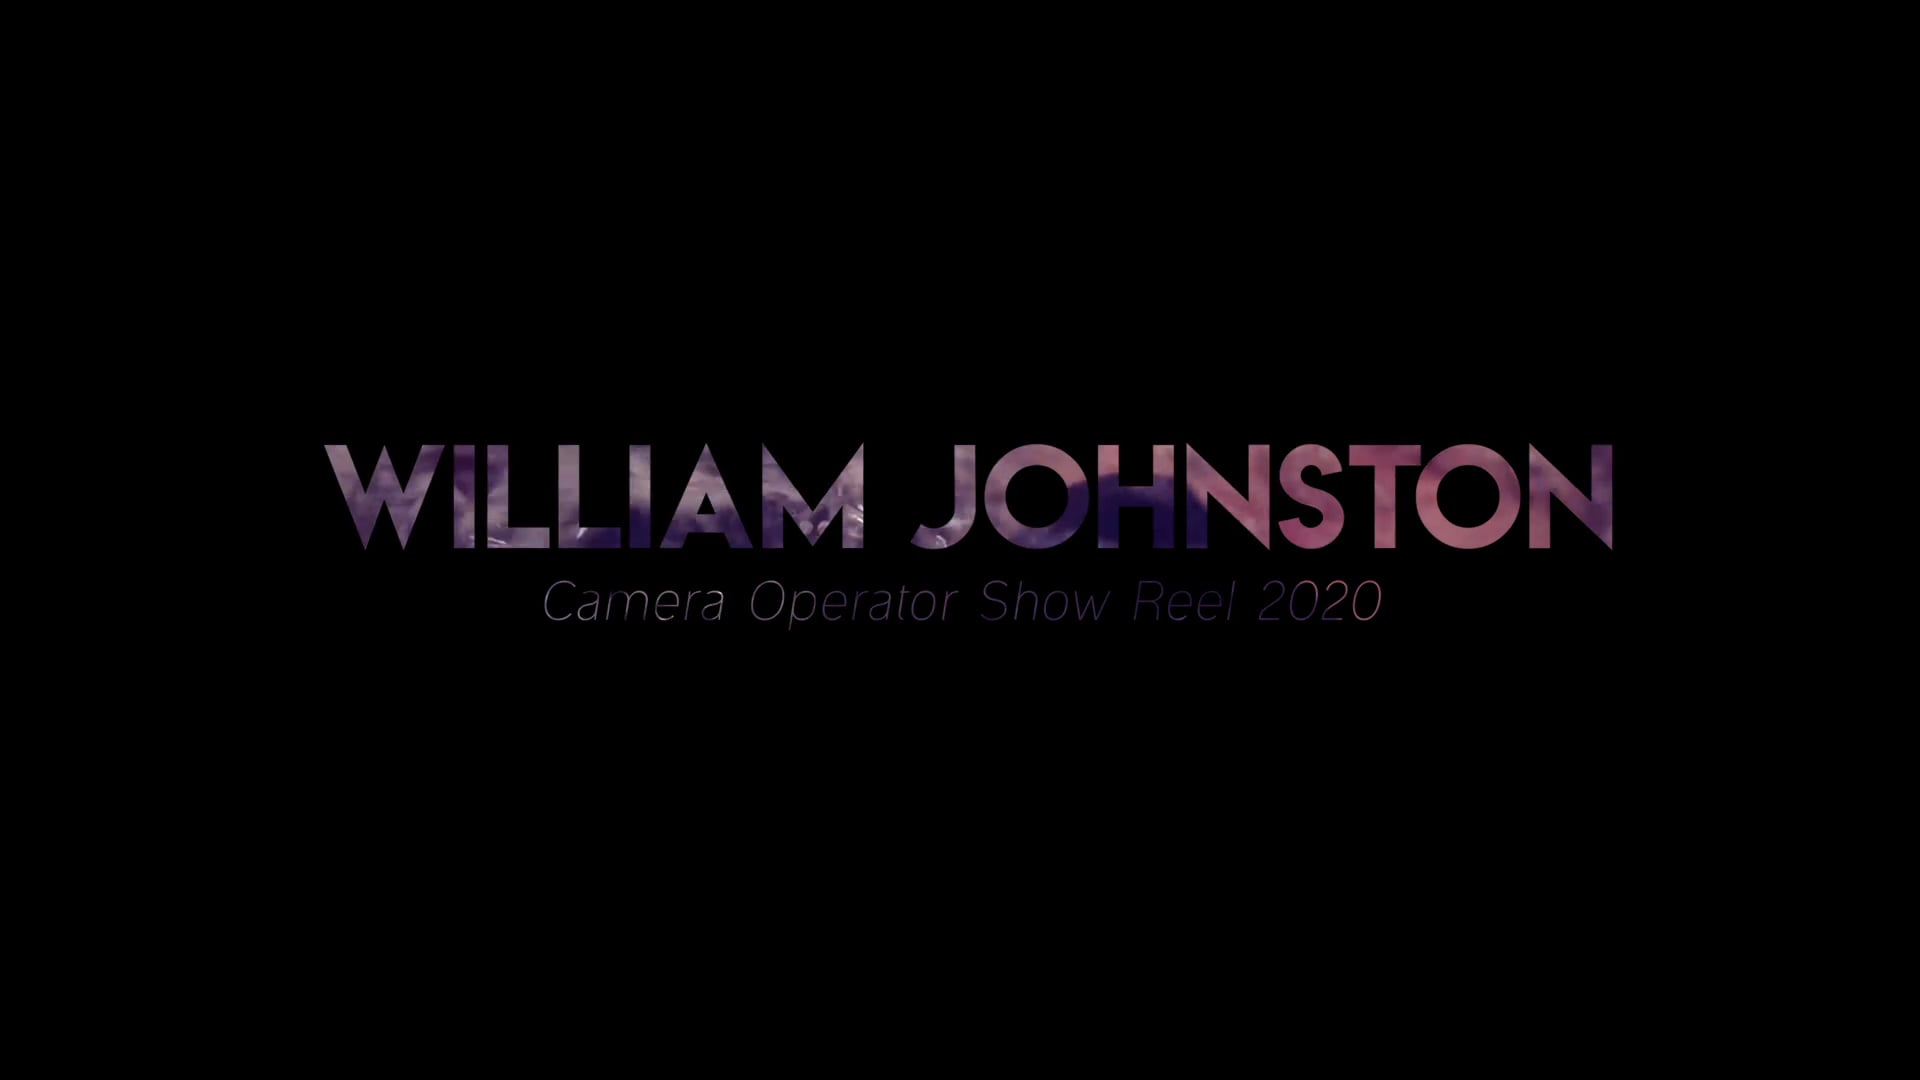 William Johnston long reel 2020